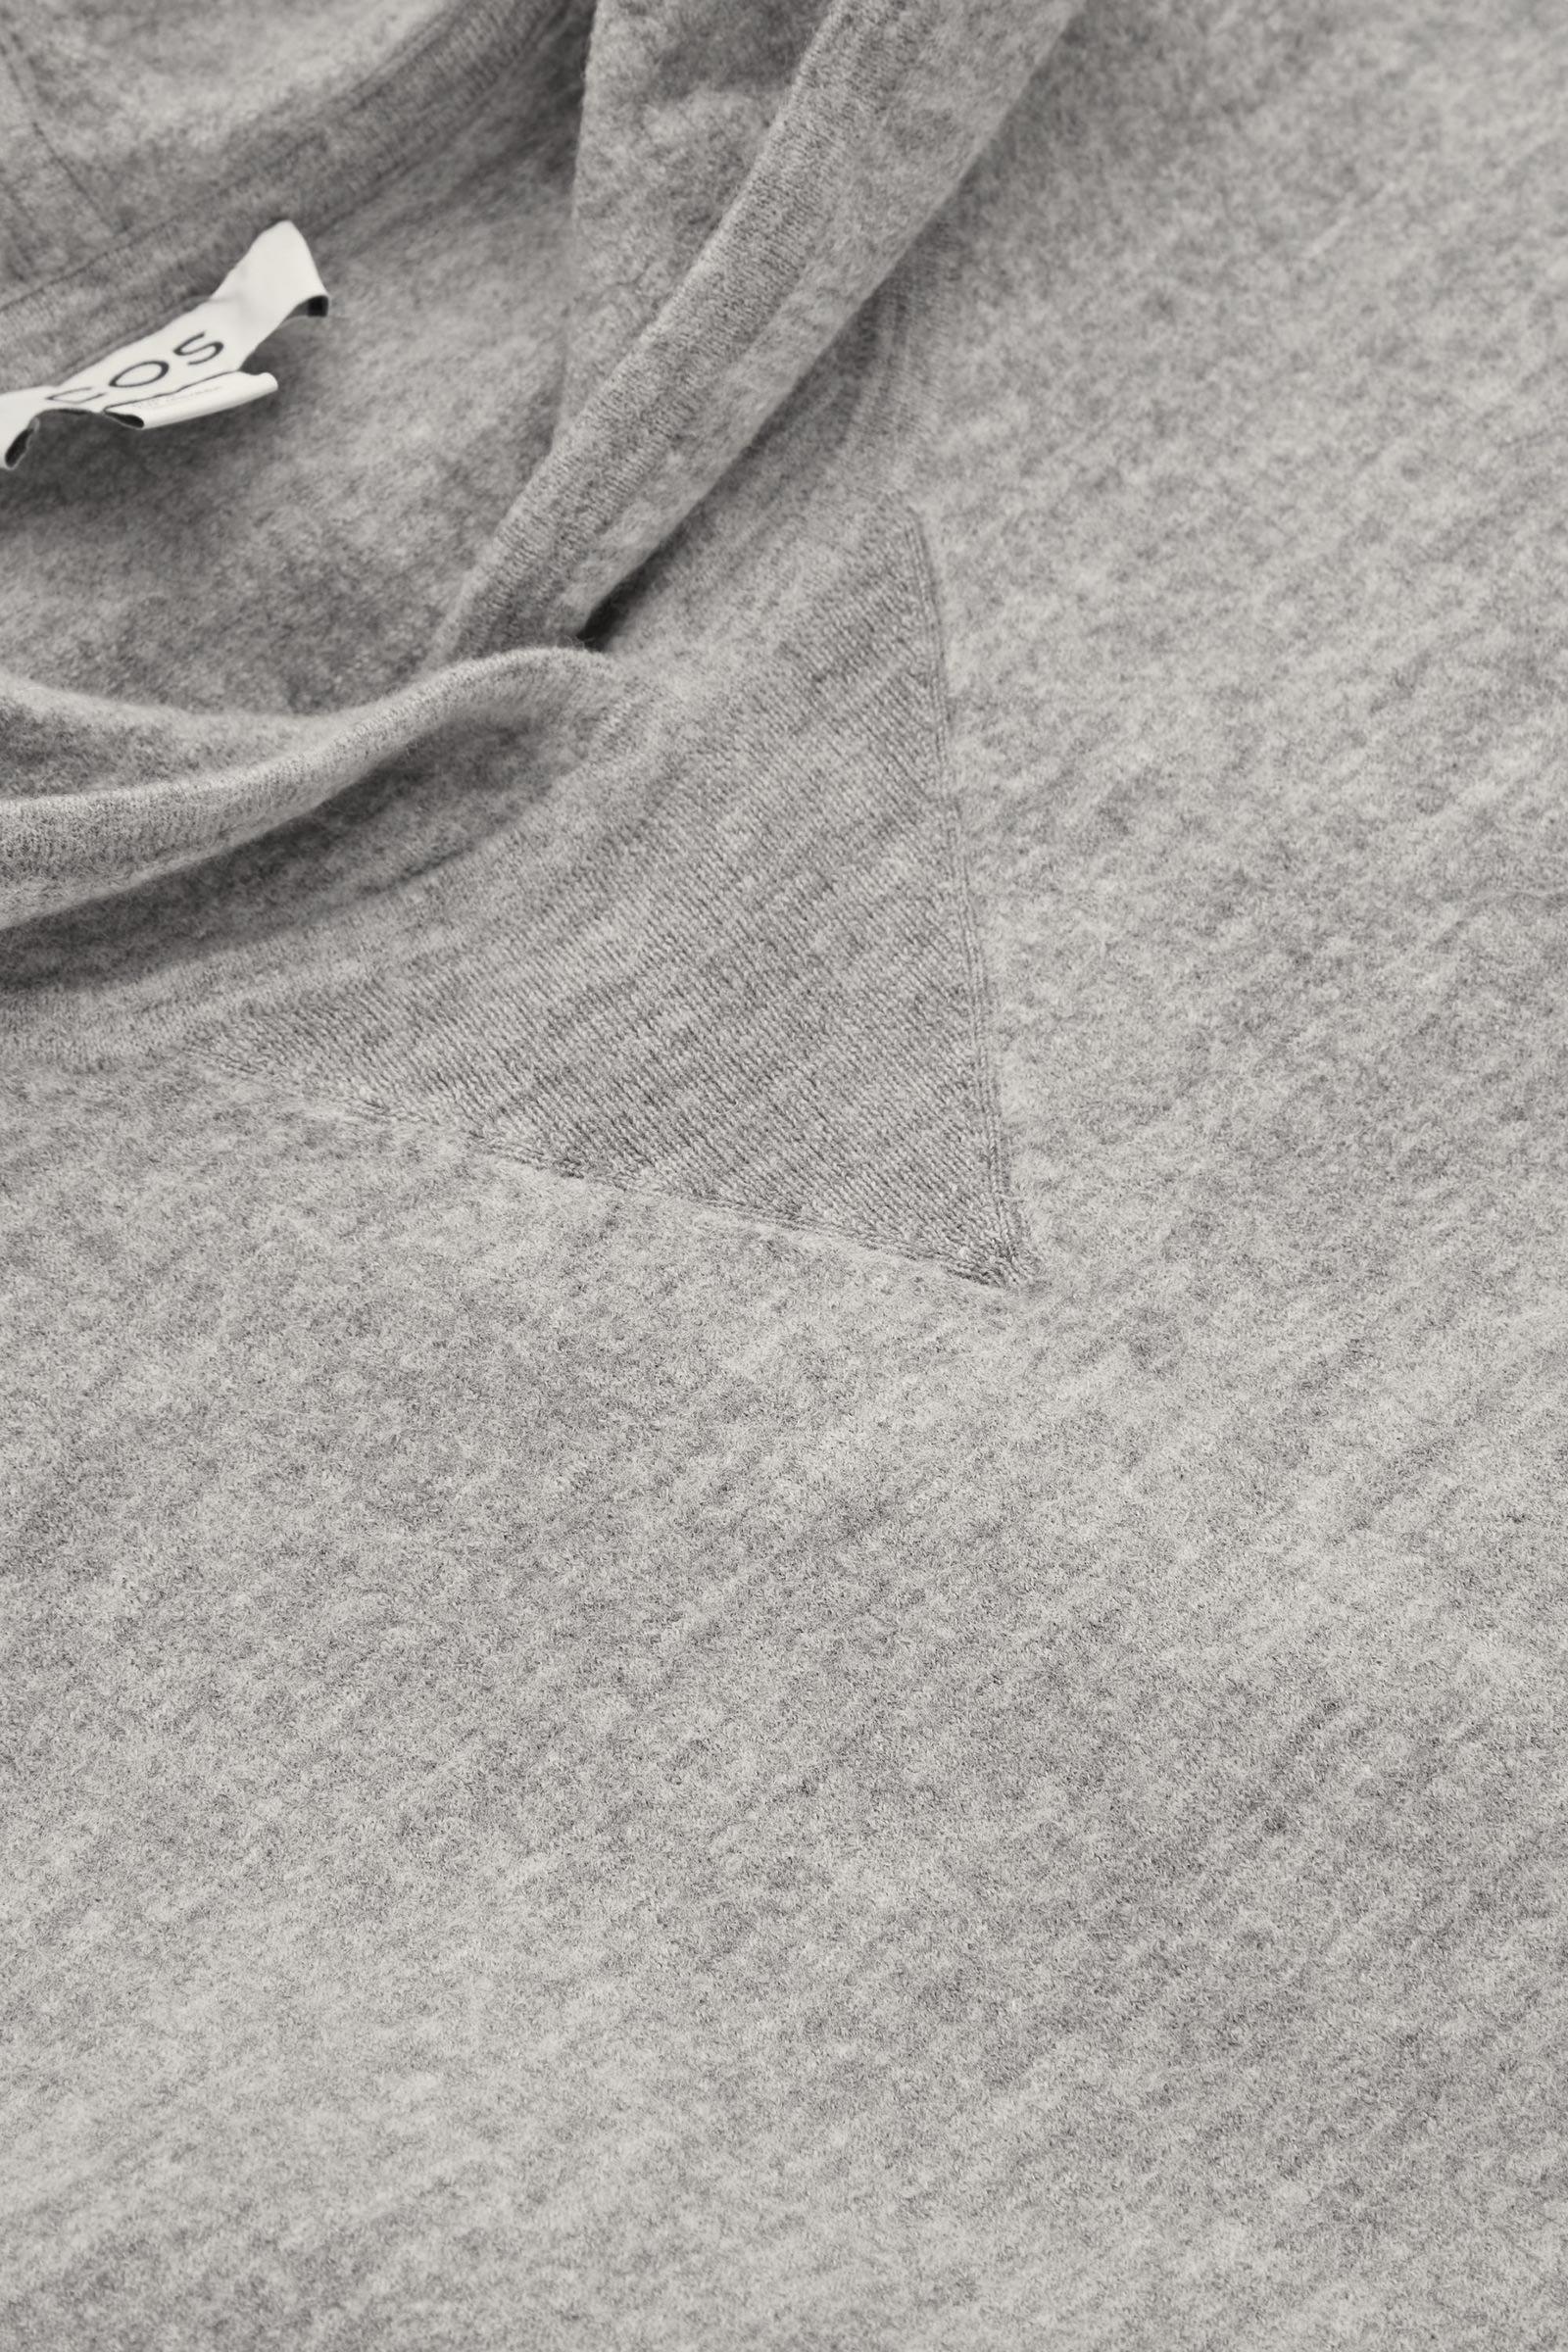 COS 오버사이즈 울 후디의 라이트 그레이컬러 Detail입니다.